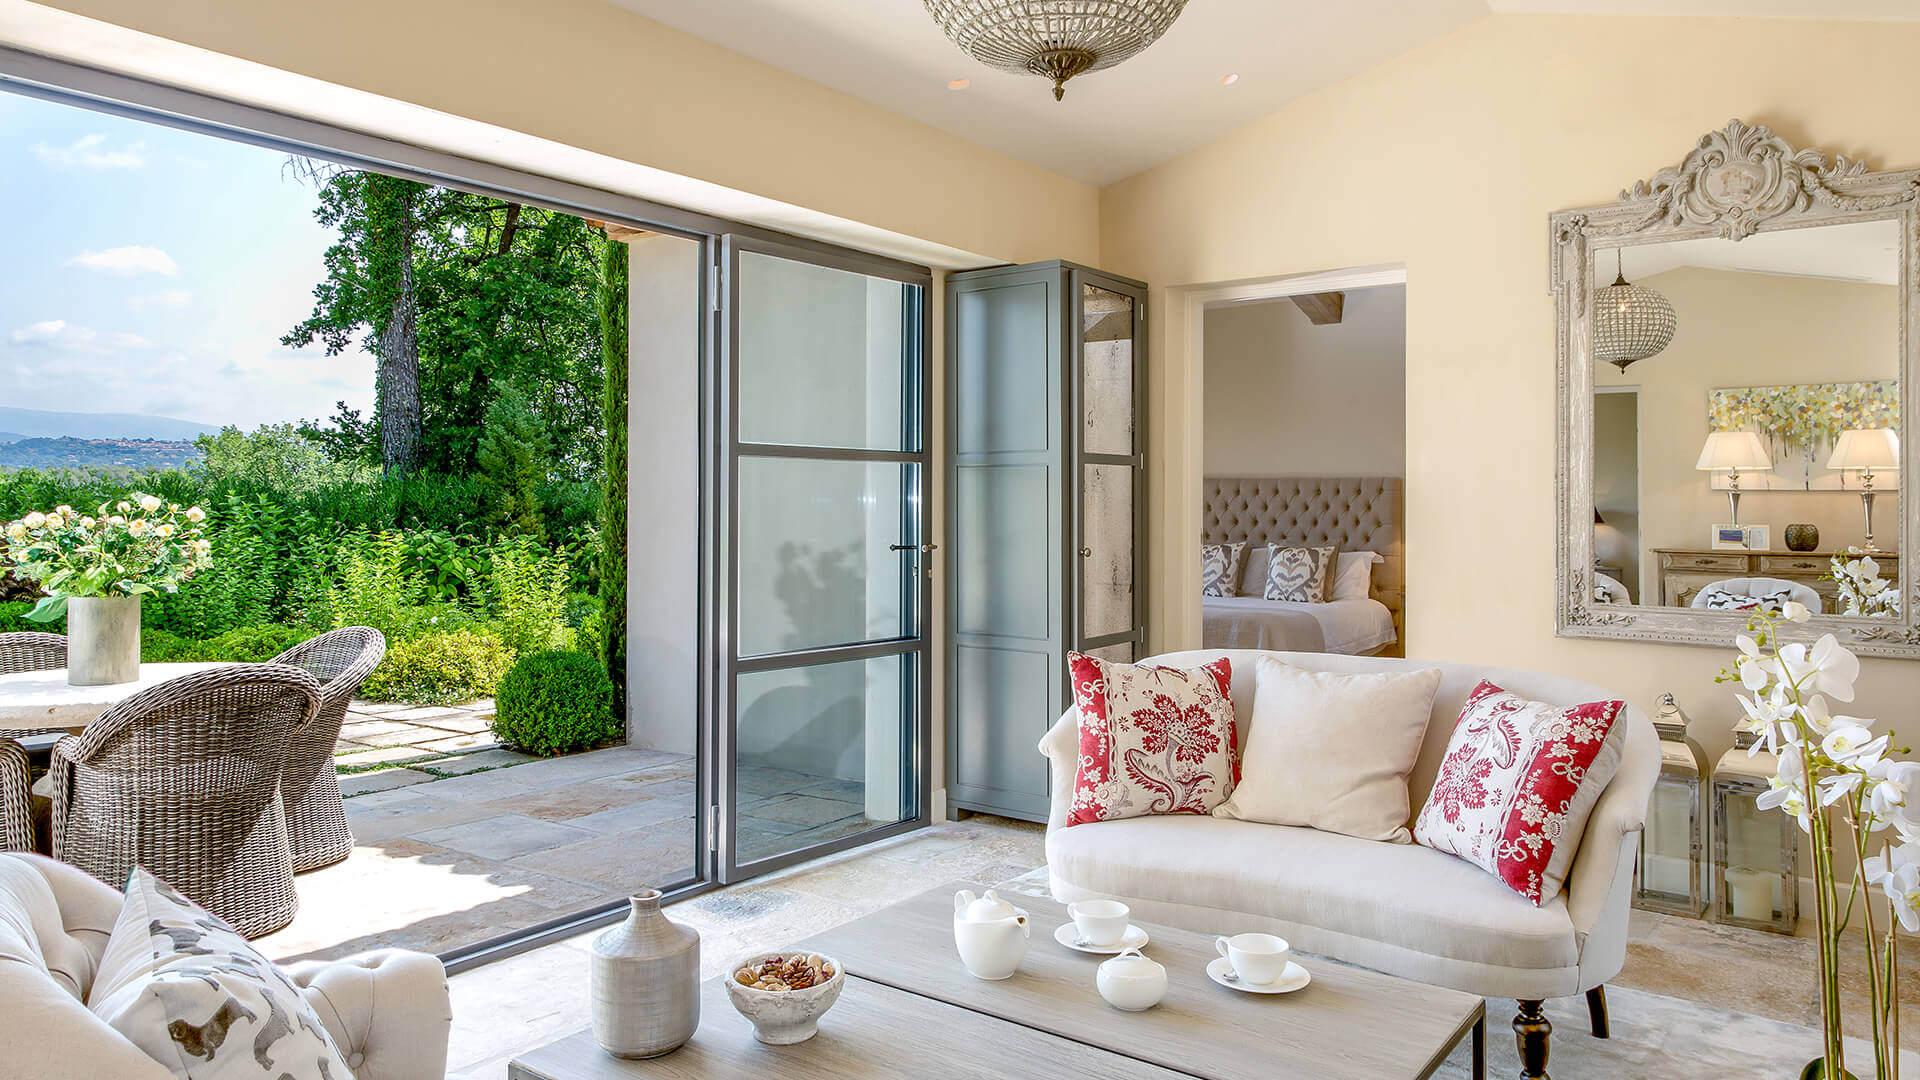 Villa Fayence living room and garden